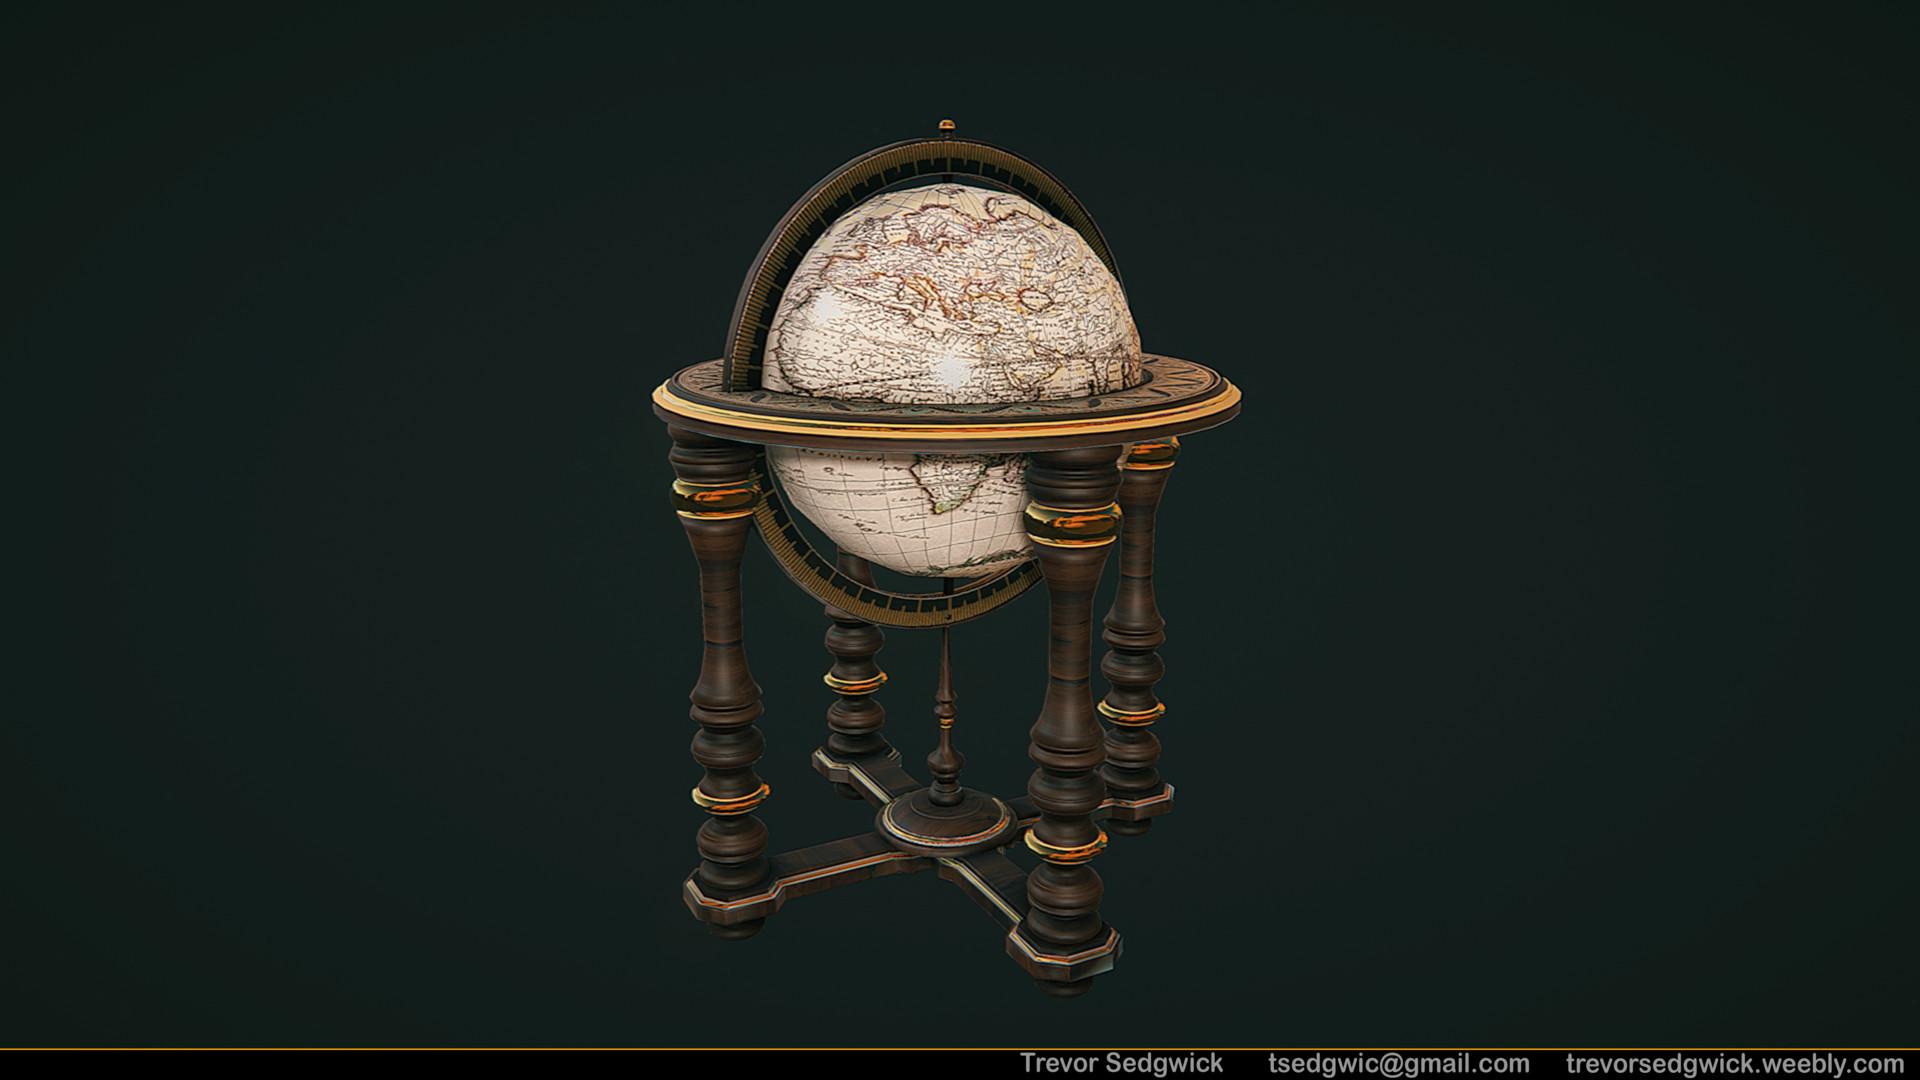 Trevor sedgwick globe large